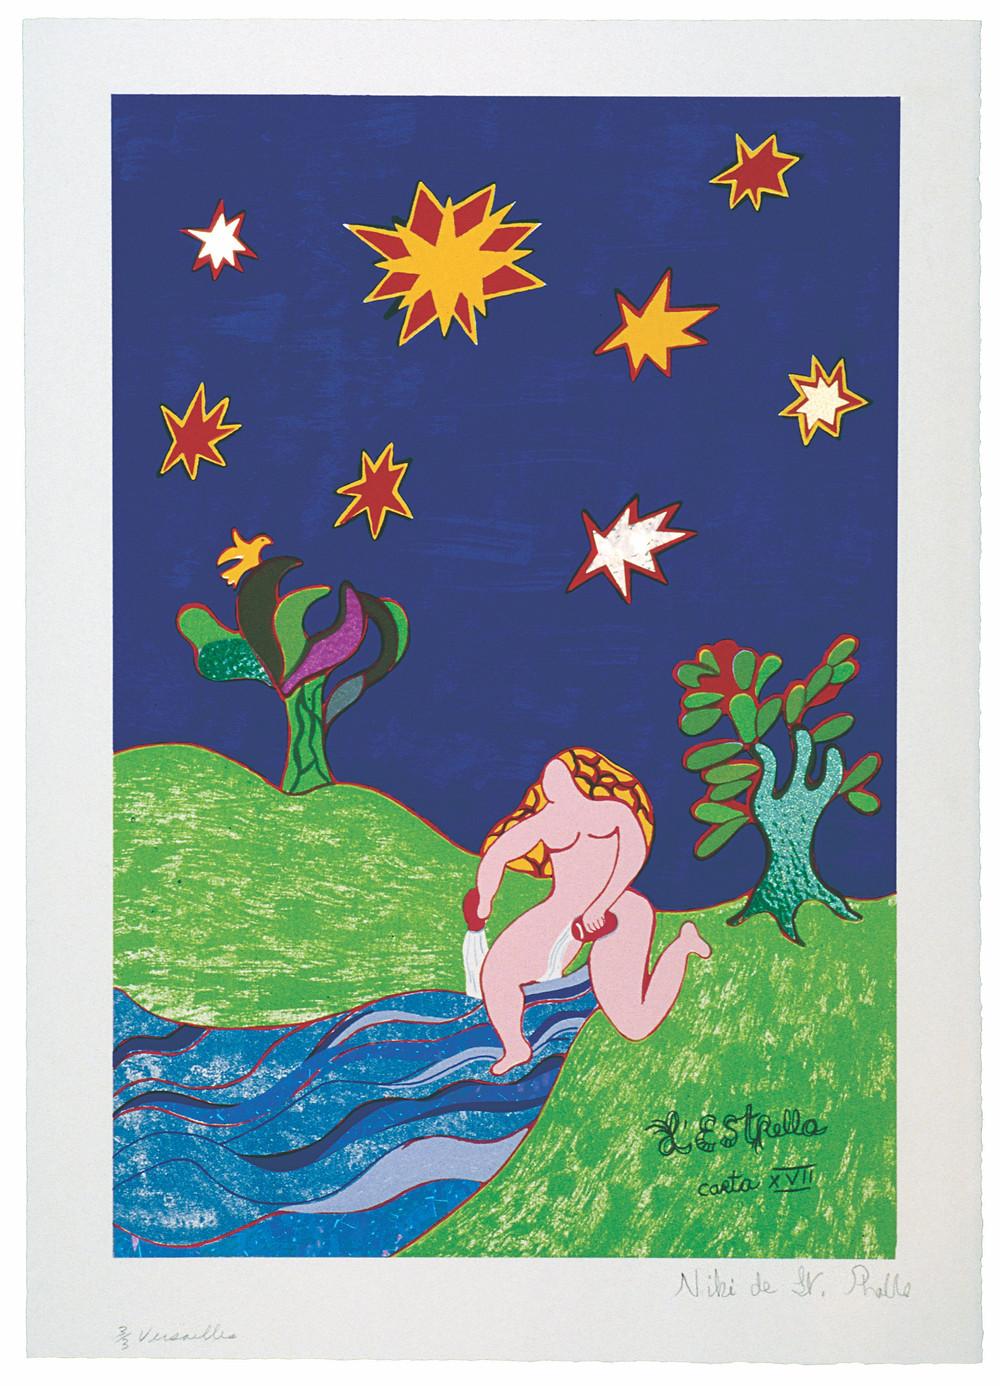 "Niki de Saint Phalle. L'Estrella Carta No. XVII (The Star). 1997. Lithograph and collage elements. 21 13/16 × 15 13/16"" (55.4 × 40.1 cm). © 2021 Niki Charitable Art Foundation"